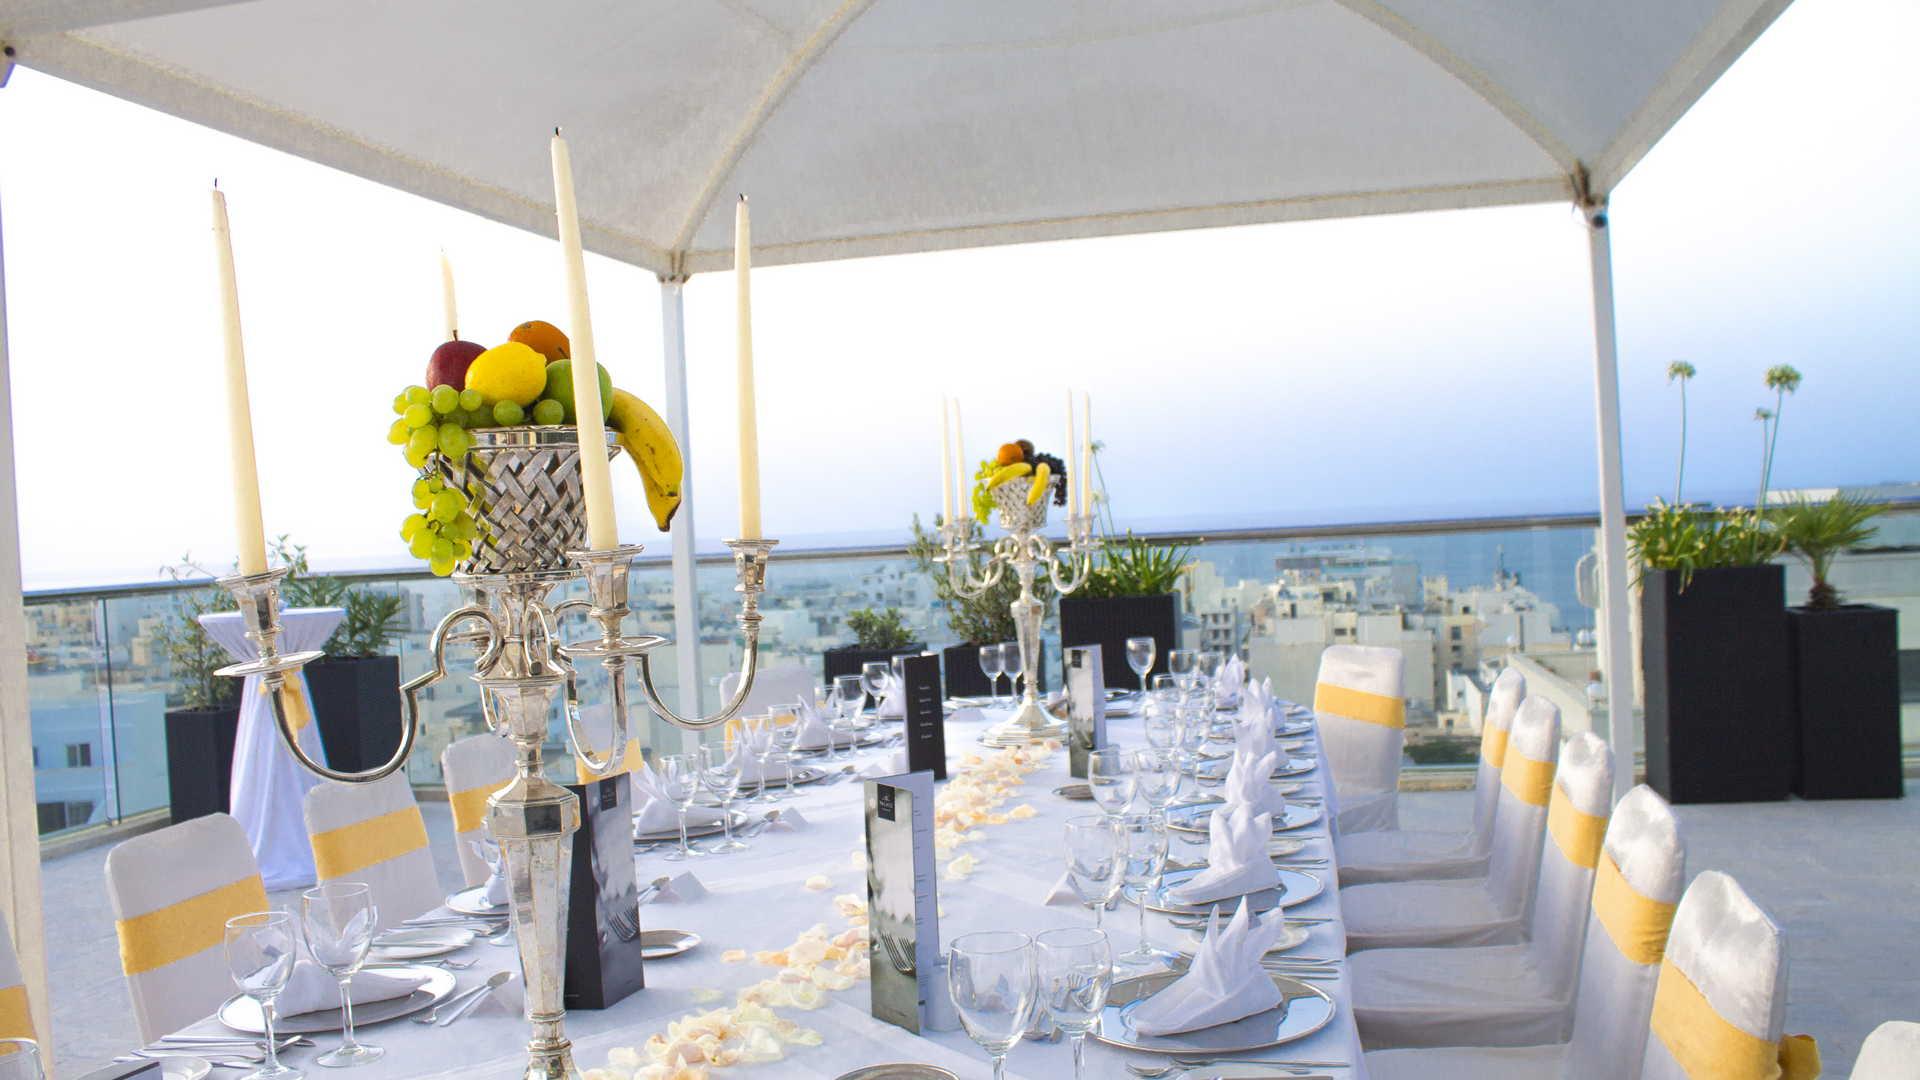 AX The Victoria Hotel - Terrazzin Wedding Event